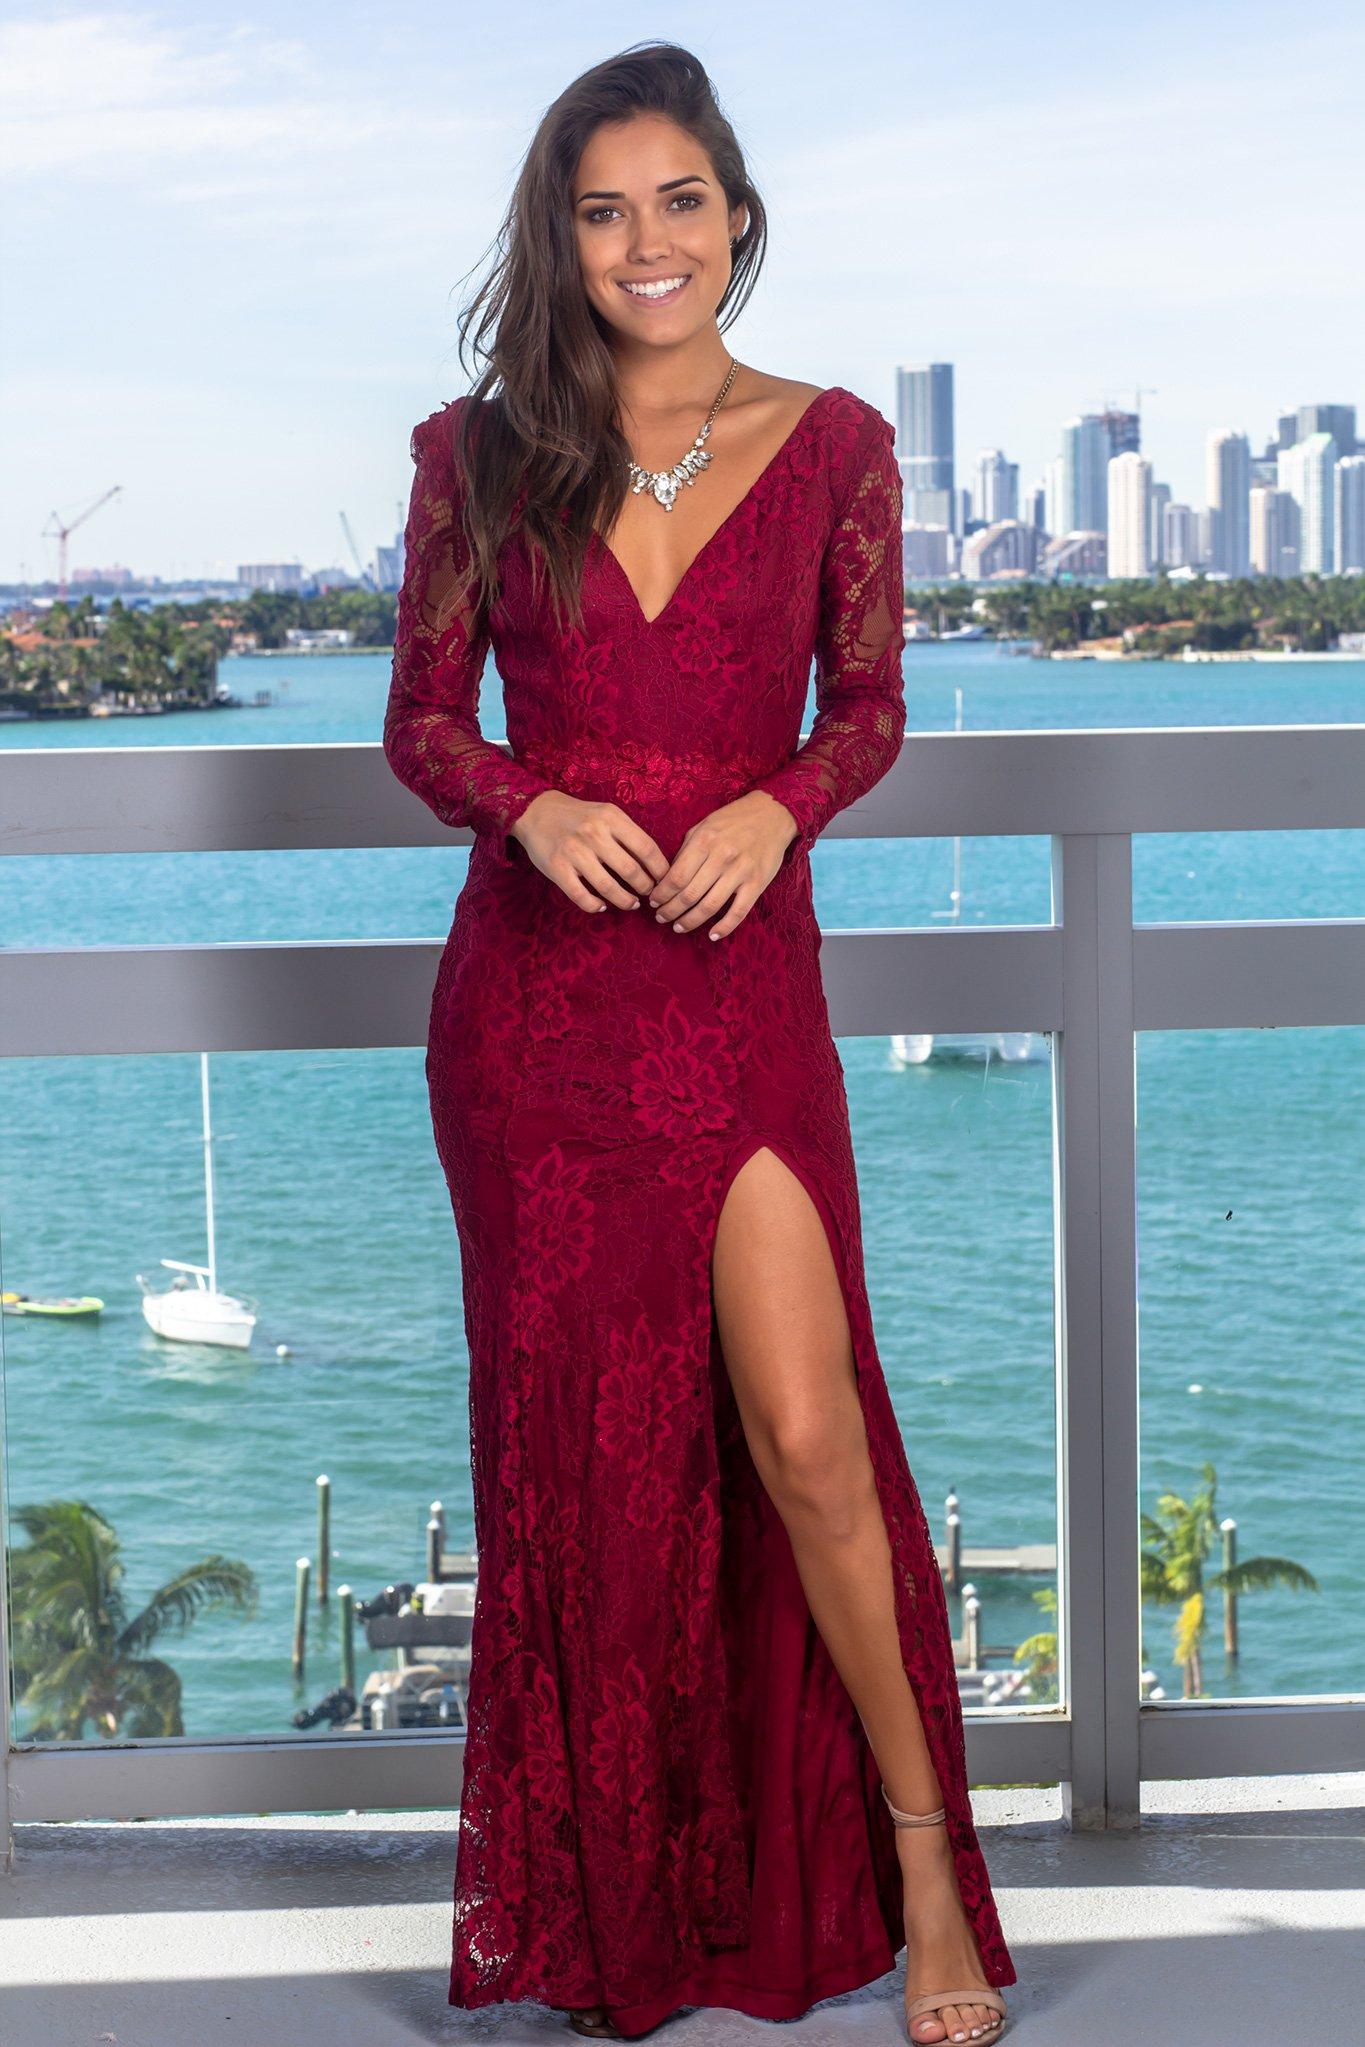 Burgundy Lace Maxi Dress With Strappy Back Burgundy Short Dress Long Sleeve Bridesmaid Dress Maxi Dress [ 2047 x 1365 Pixel ]